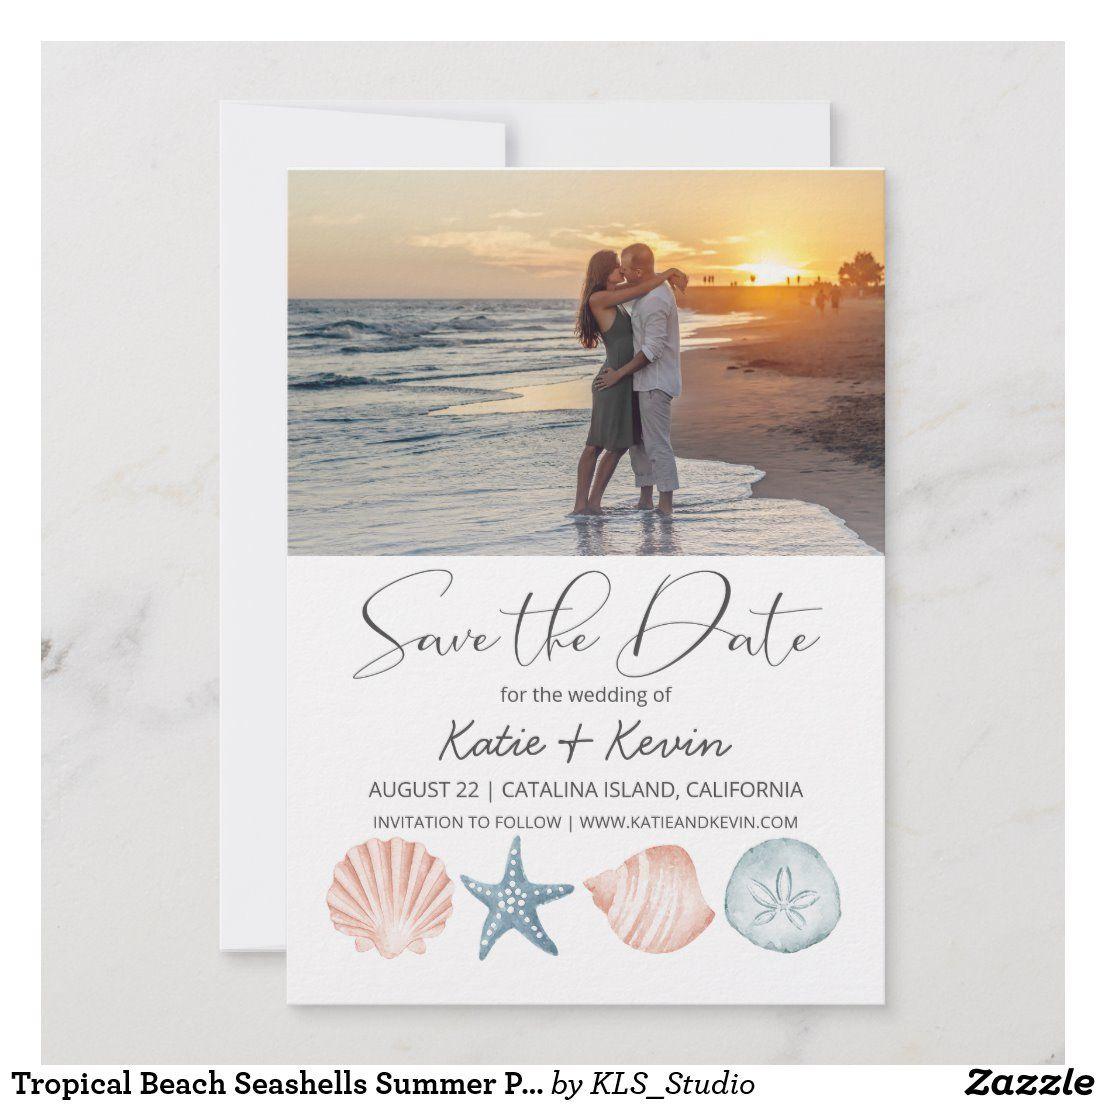 Tropical Beach Seashells Summer Photo Wedding Save The